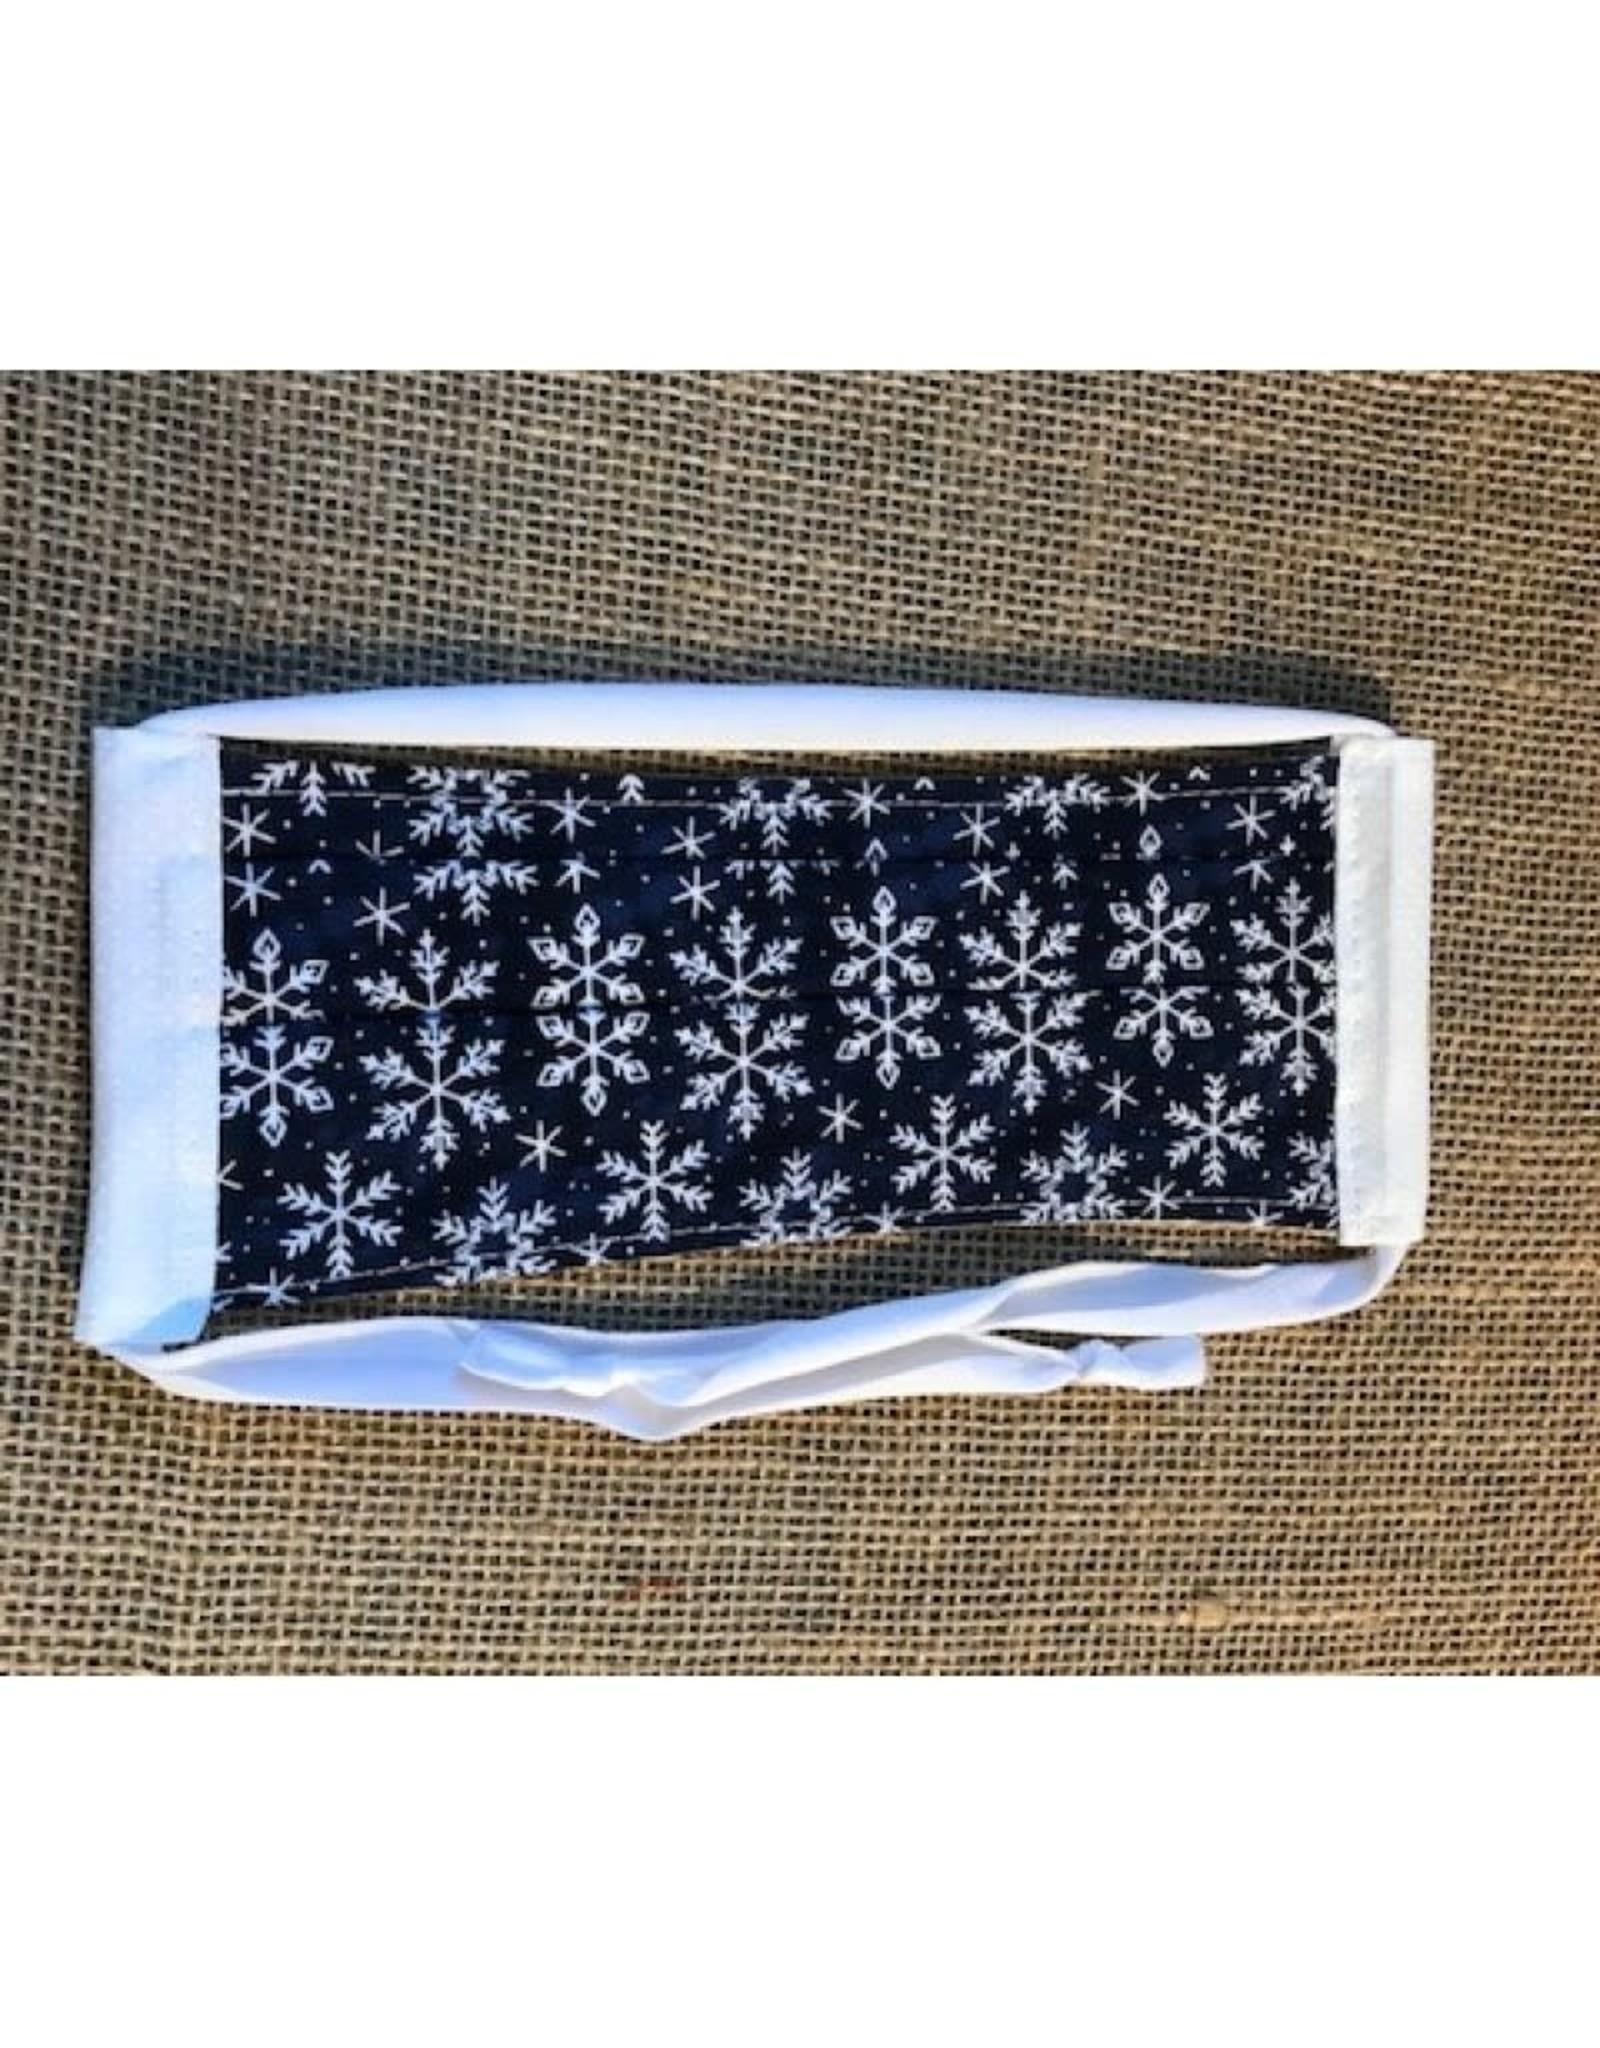 Bear Den Handmade Cotton Mask - White Snowflakes on Blue